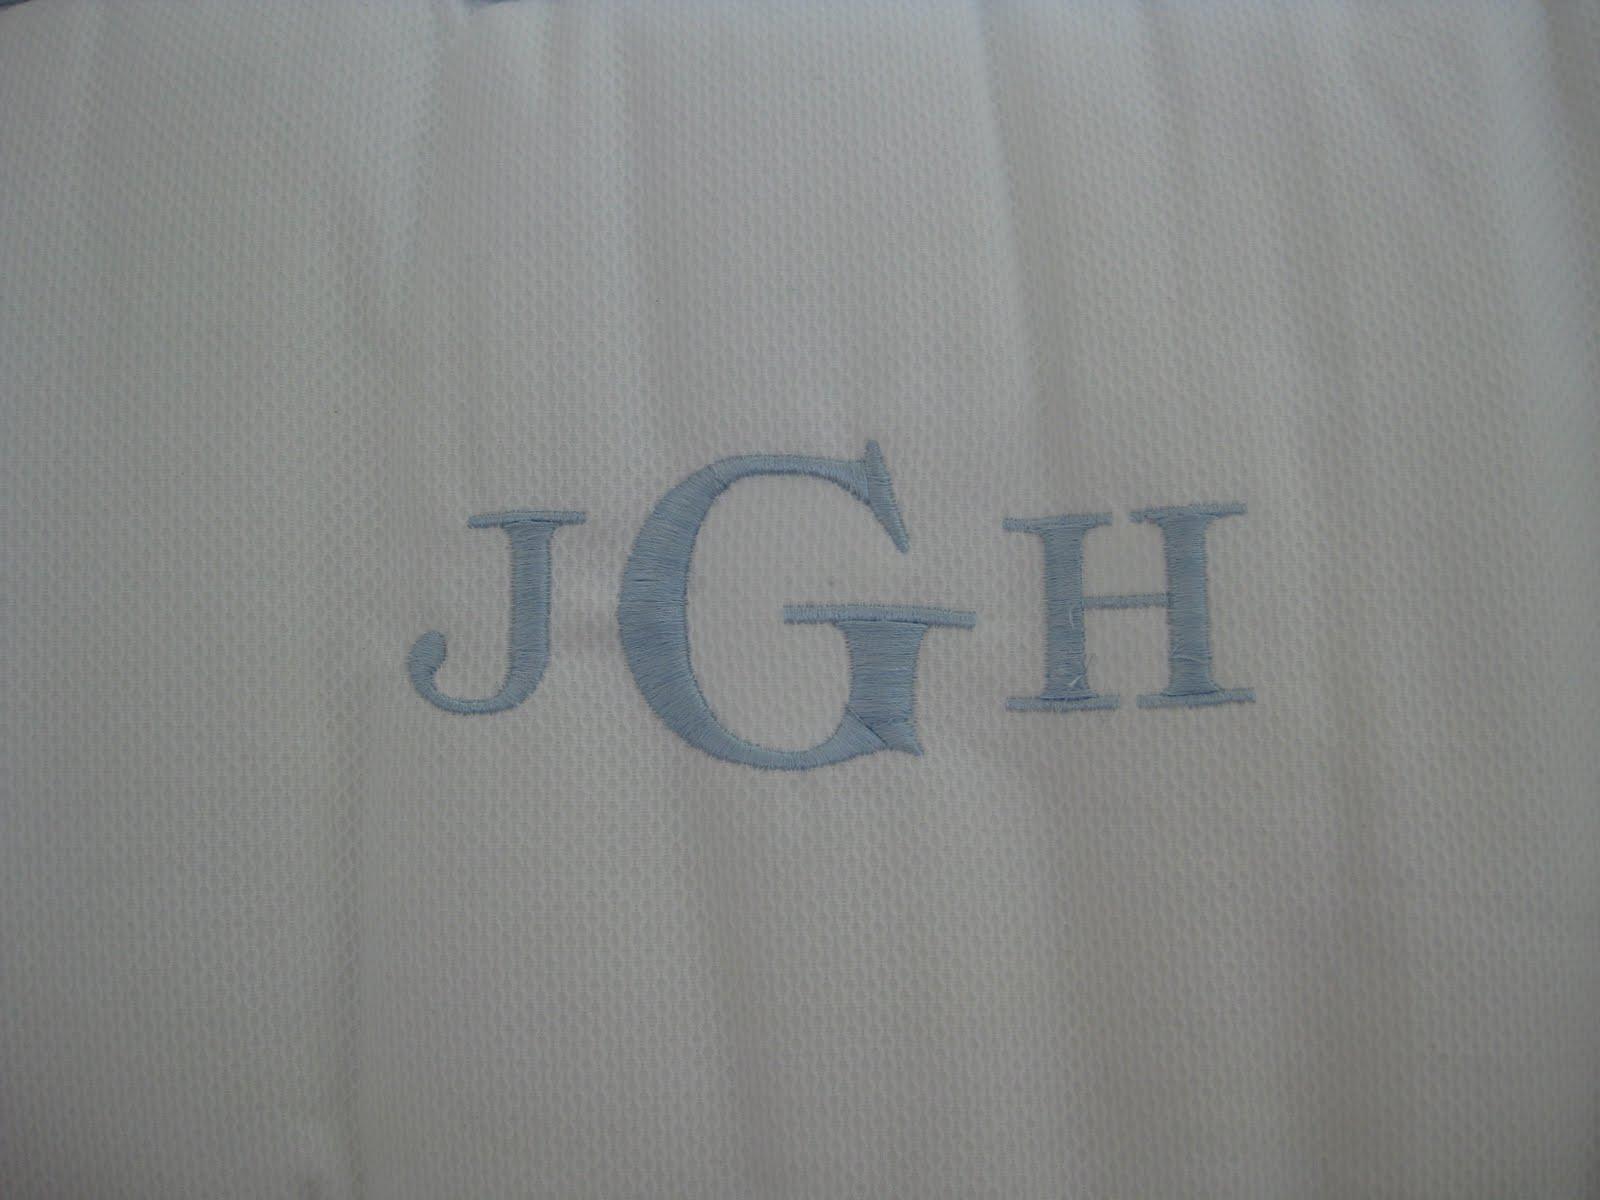 http://2.bp.blogspot.com/_G-AL7Z_jI2k/S793TH5YfsI/AAAAAAAAArE/sMaNam-6YTc/s1600/jamesbedding%2B002.JPG